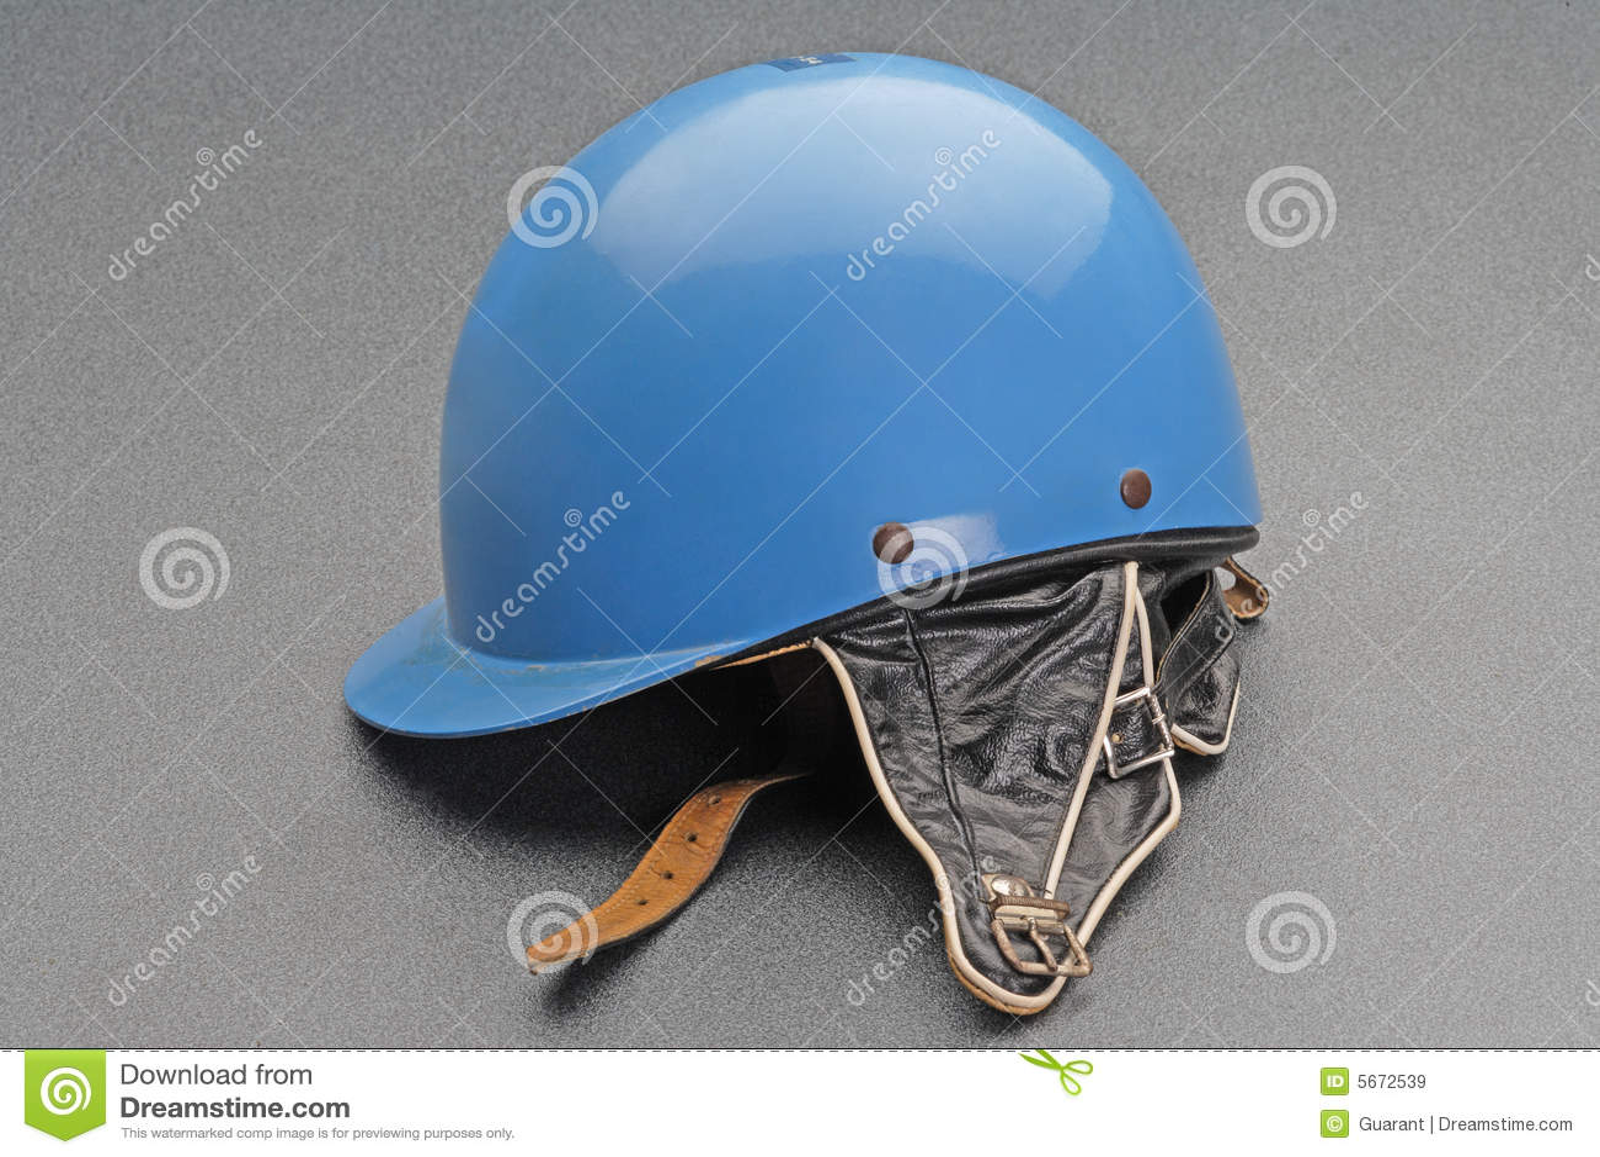 Race Track Lap Timer >> Old Racing Car Crash Helmet Royalty Free Stock Images - Image: 5672539